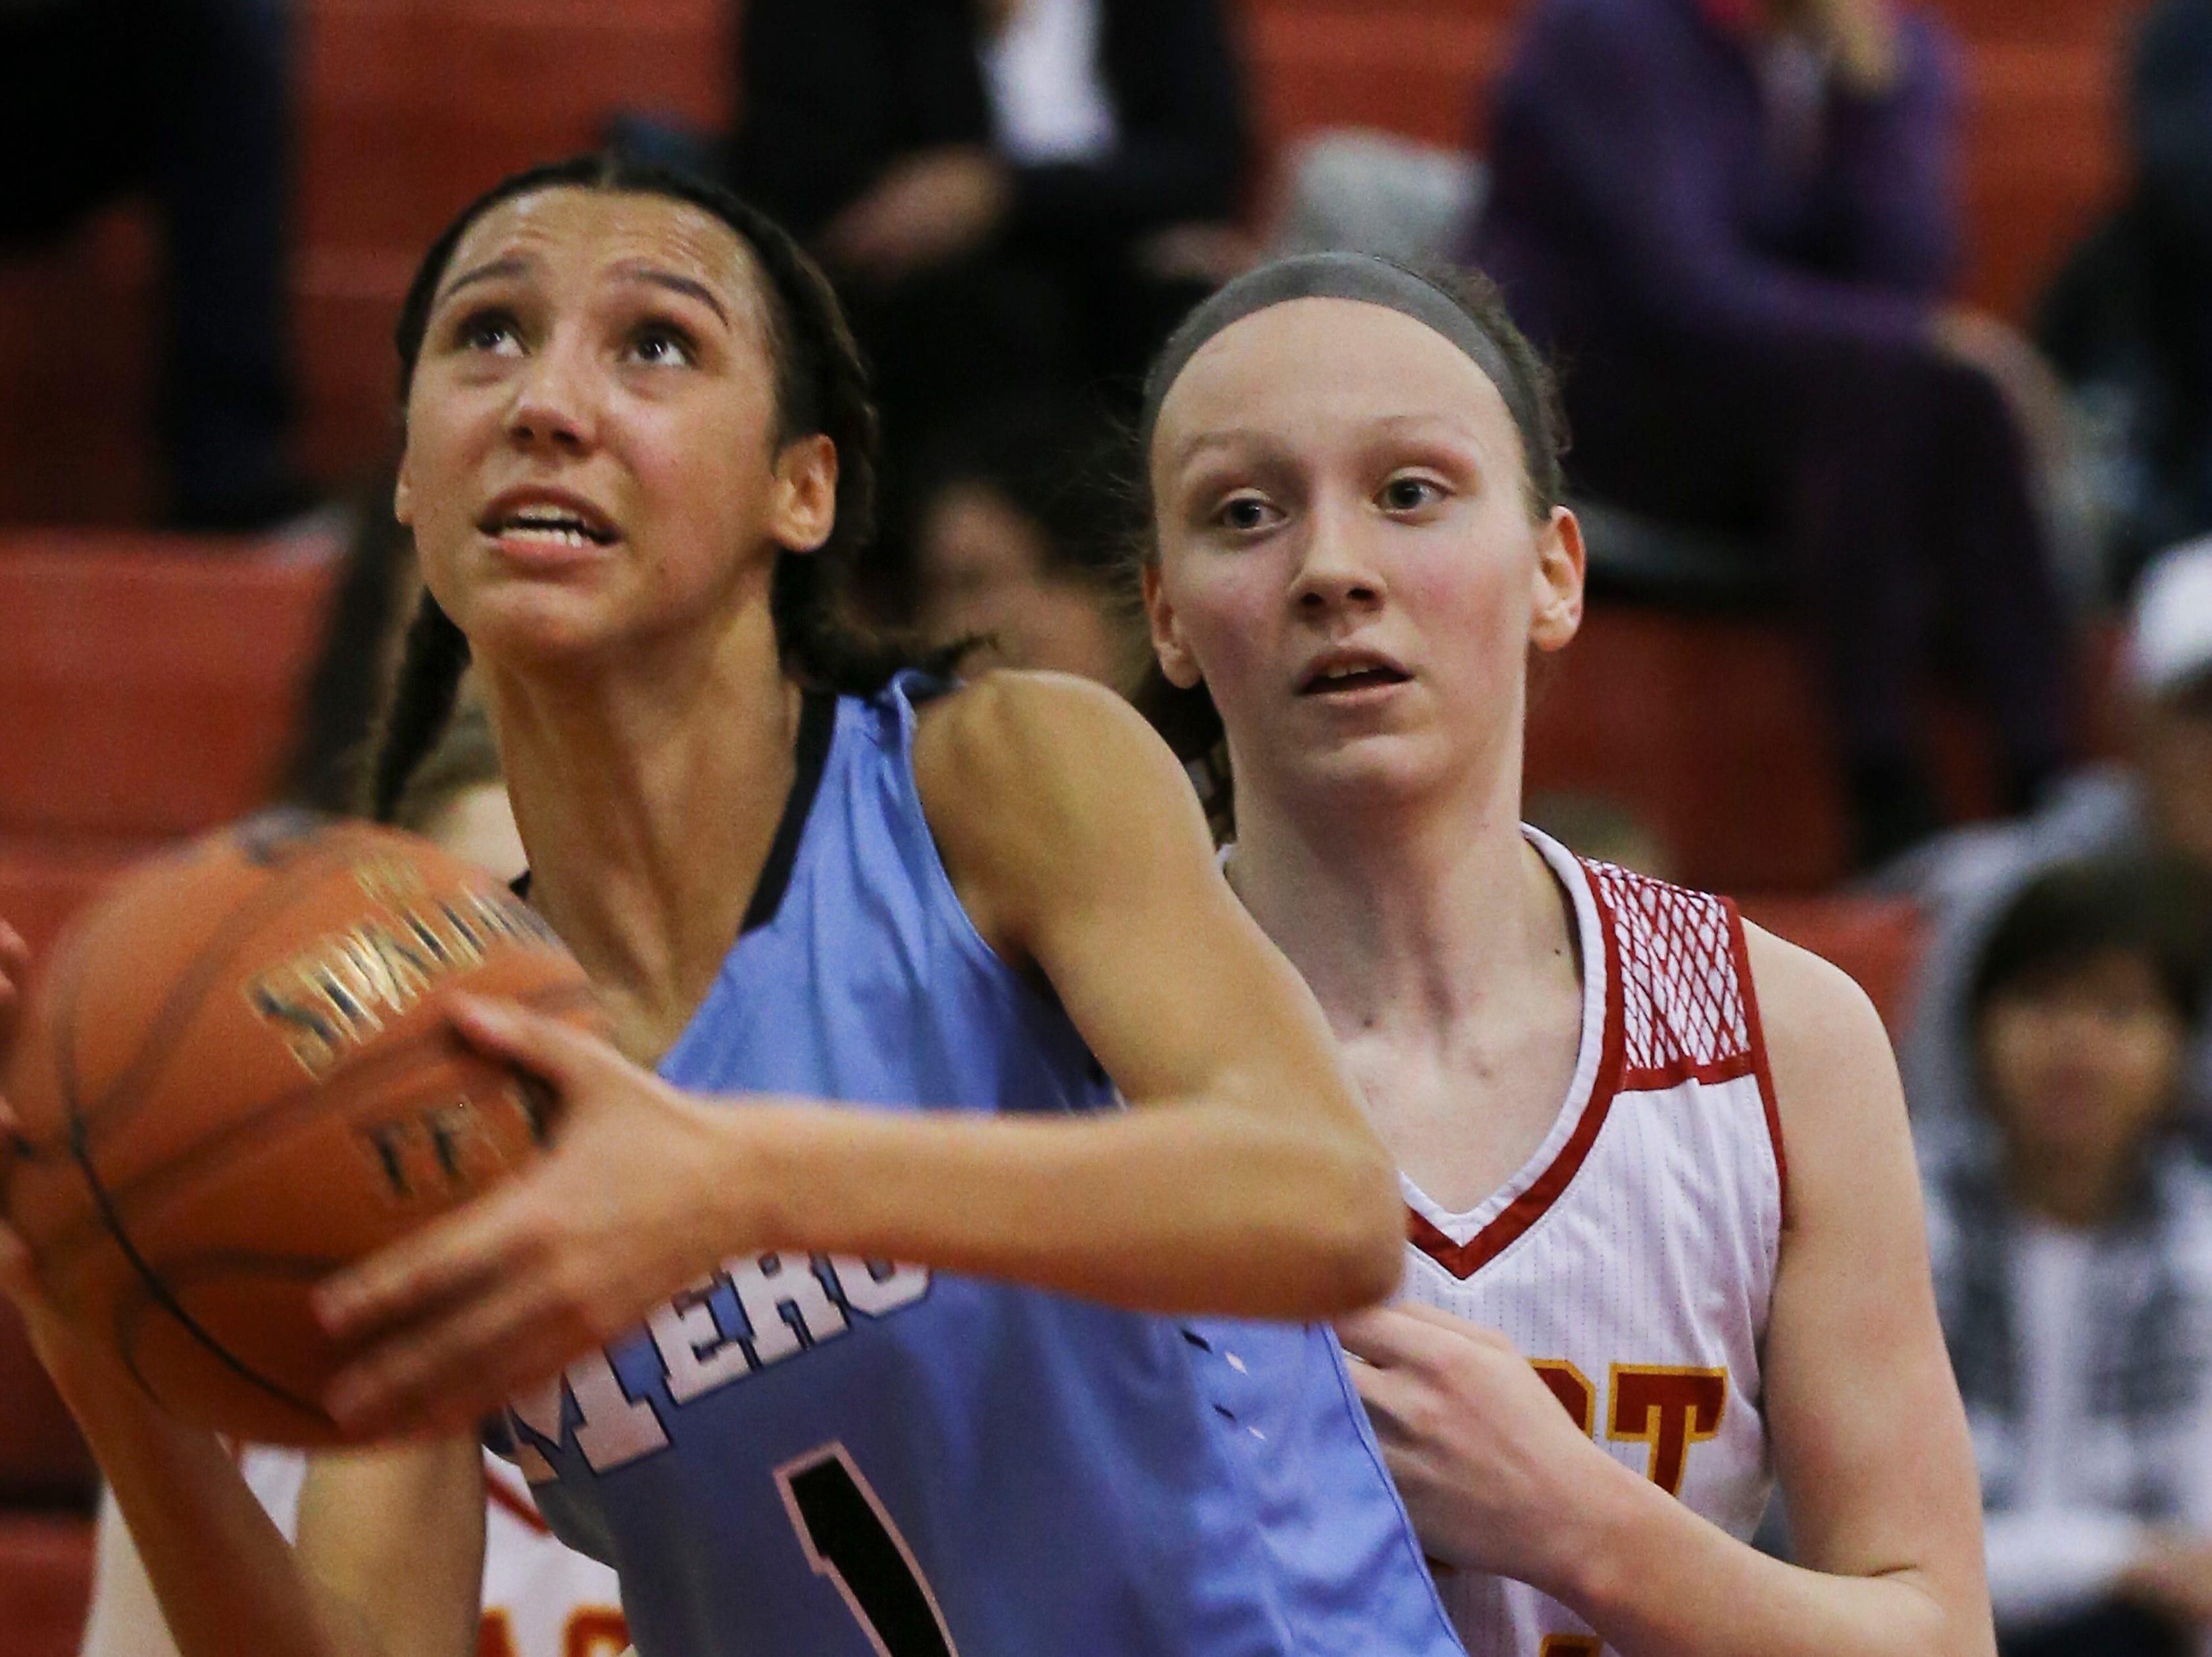 Mercy's Taziah Jenks (1) got past the defense as she made a move towards the basket against Bullitt East at the Bullitt East High School.Jan. 9, 2019